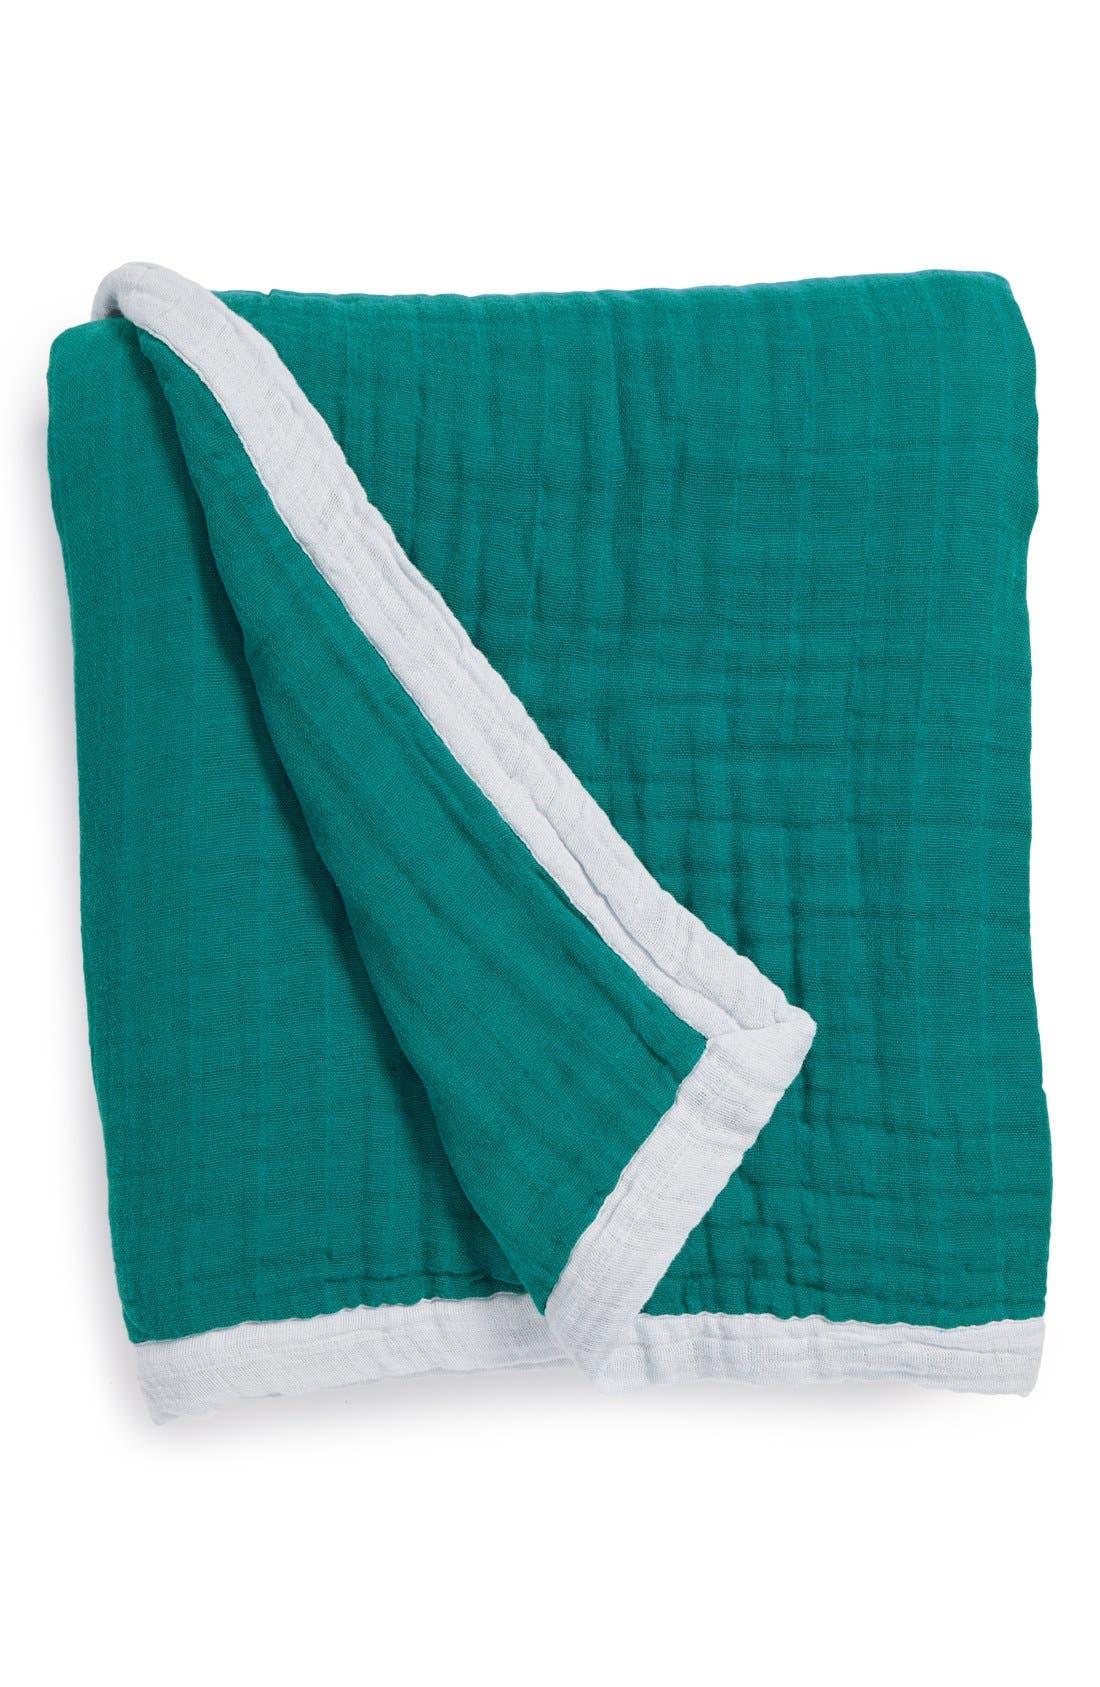 Main Image - aden + anais Classic Daydream Blanket™